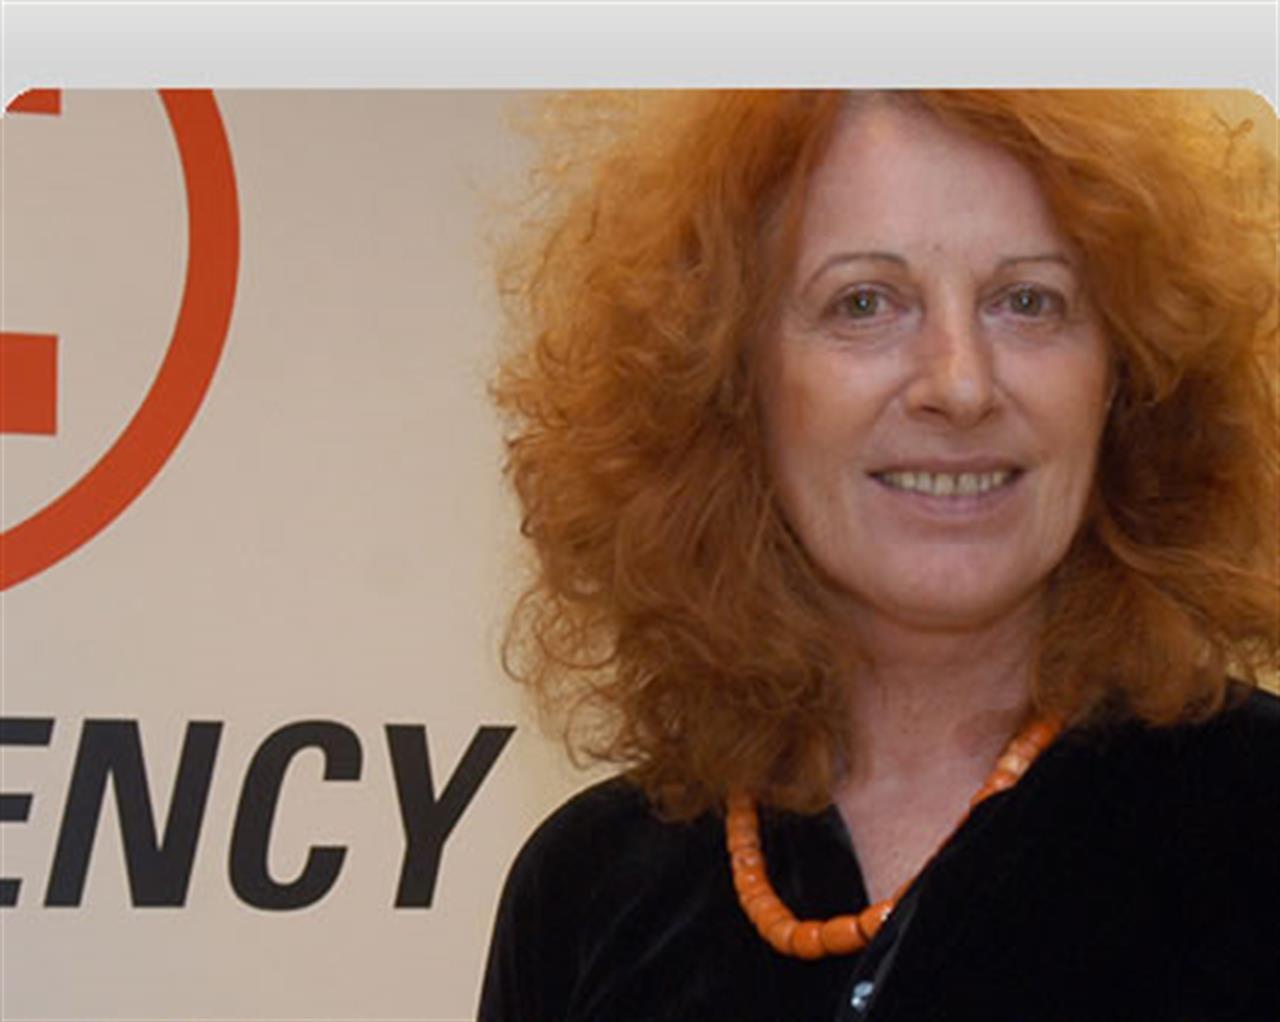 Dieci Anni Senza Teresa Sarti, Con Emergency Ha Portato Sanità Di Eccellenza In Africa